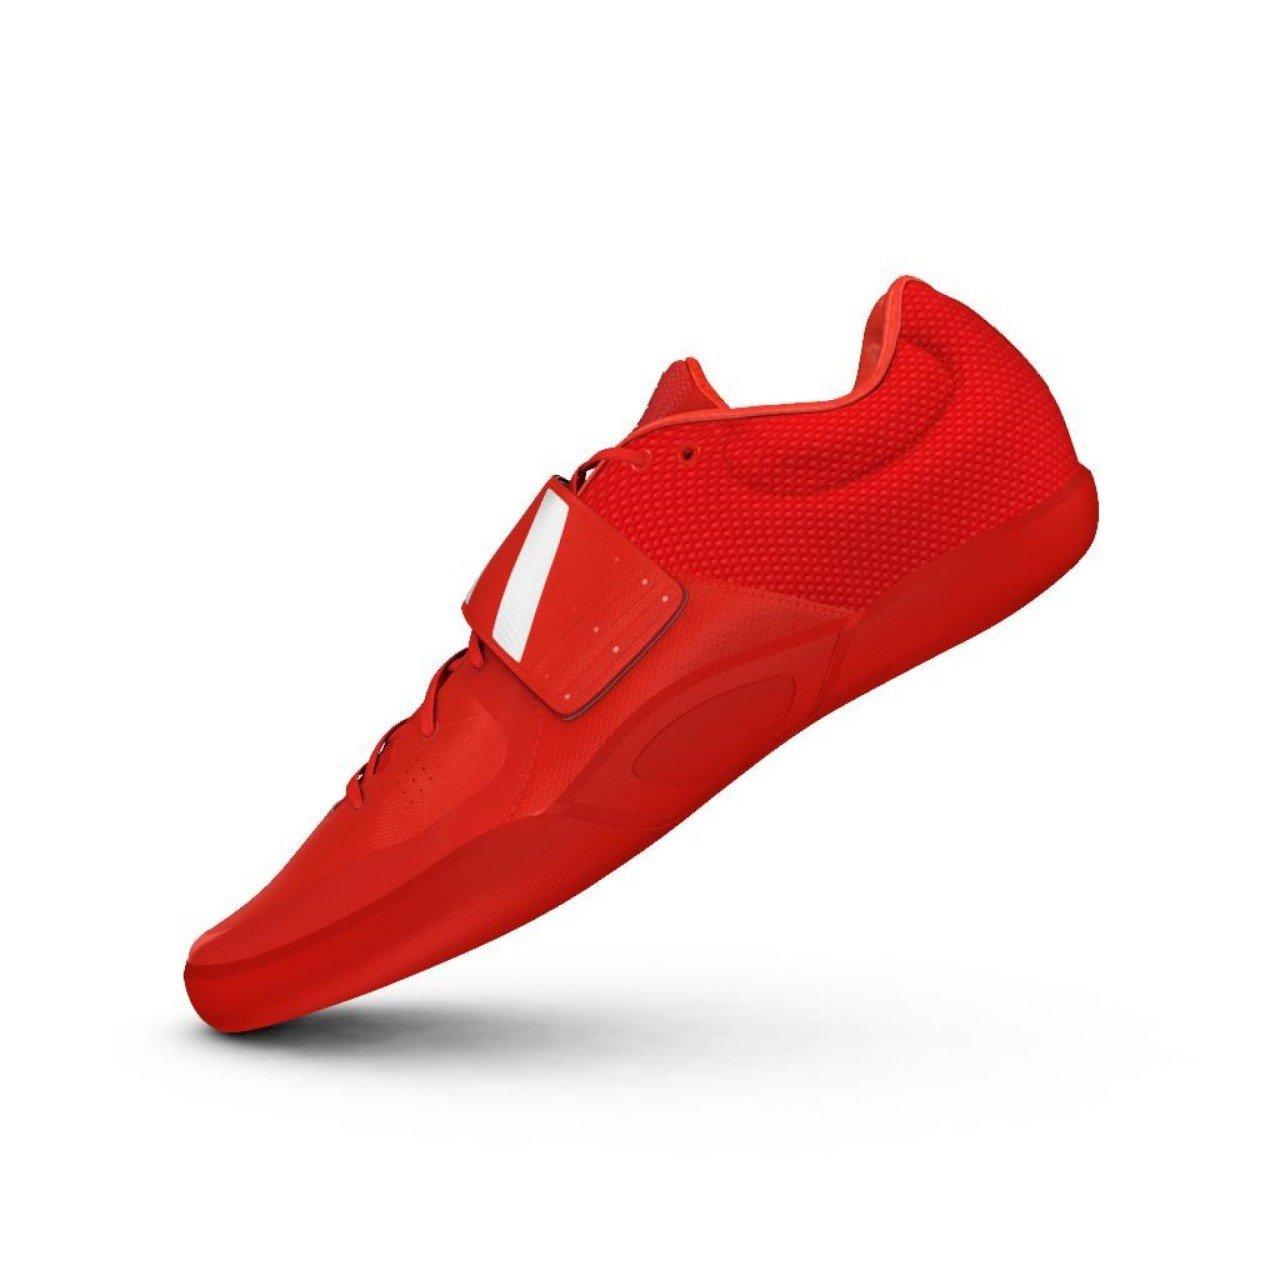 Adidas Adizero Discus/Hammer Throw, Zapatillas de Atletismo Unisex Adulto BB4955